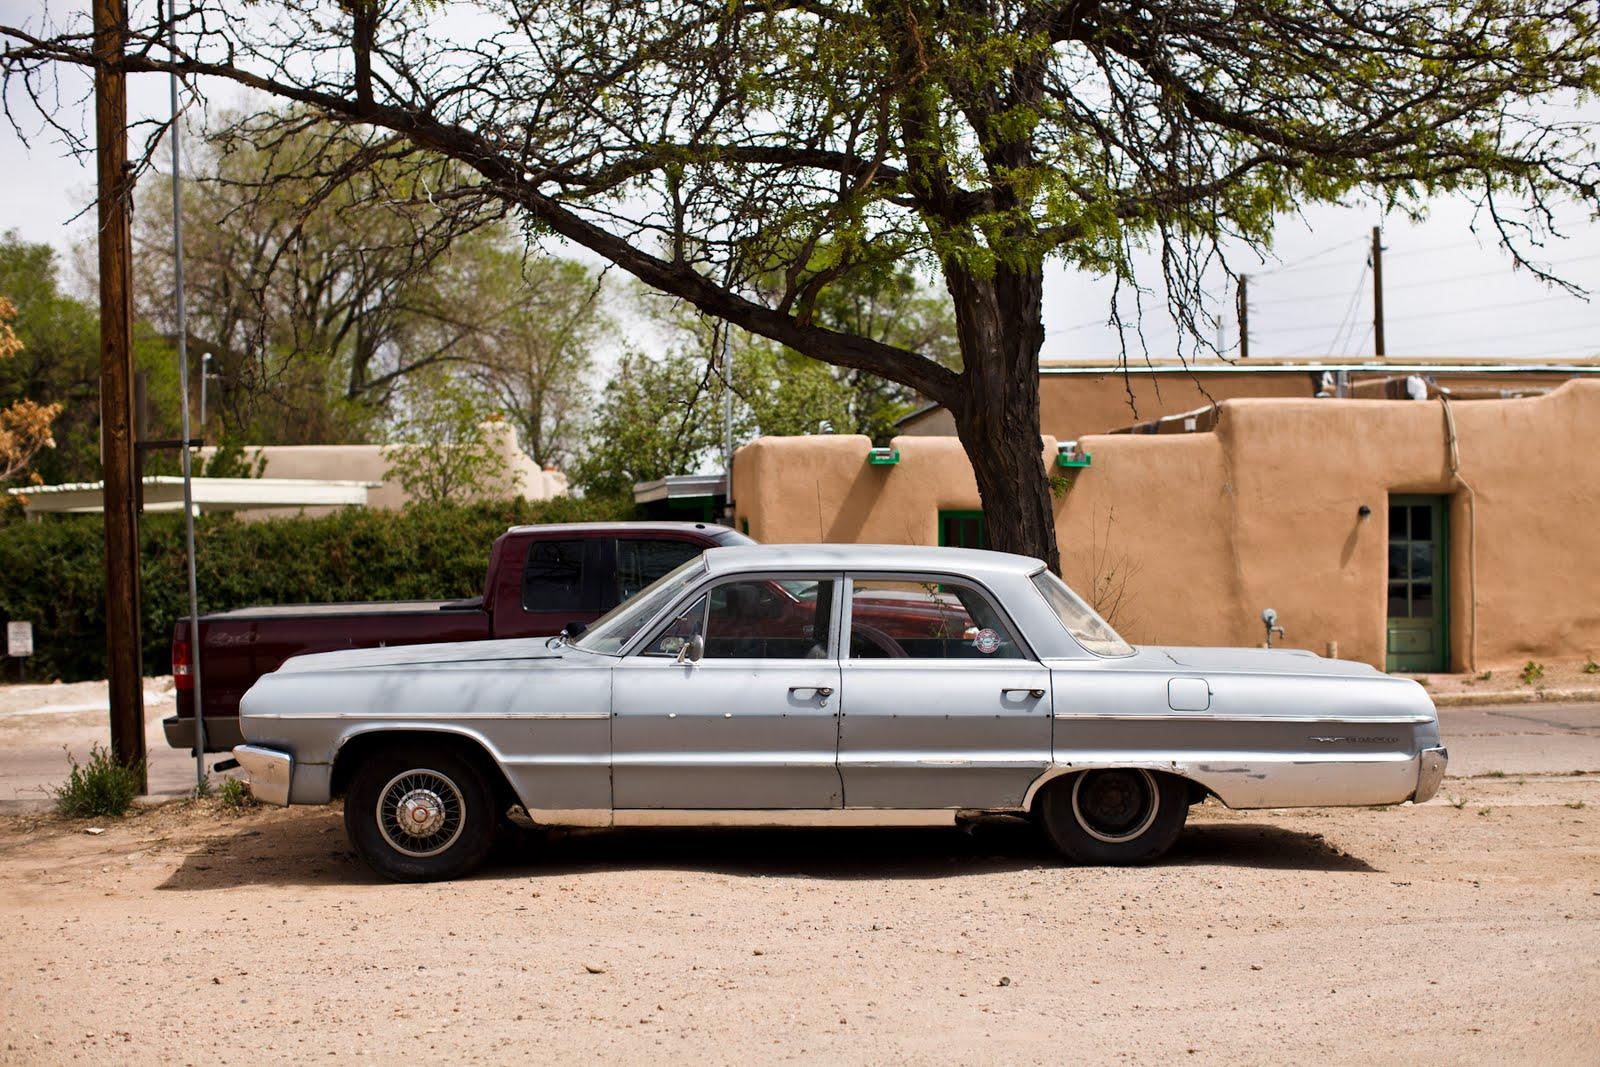 All Chevy chevy bel air 1964 THE STREET PEEP: 1964 Chevrolet Bel Air